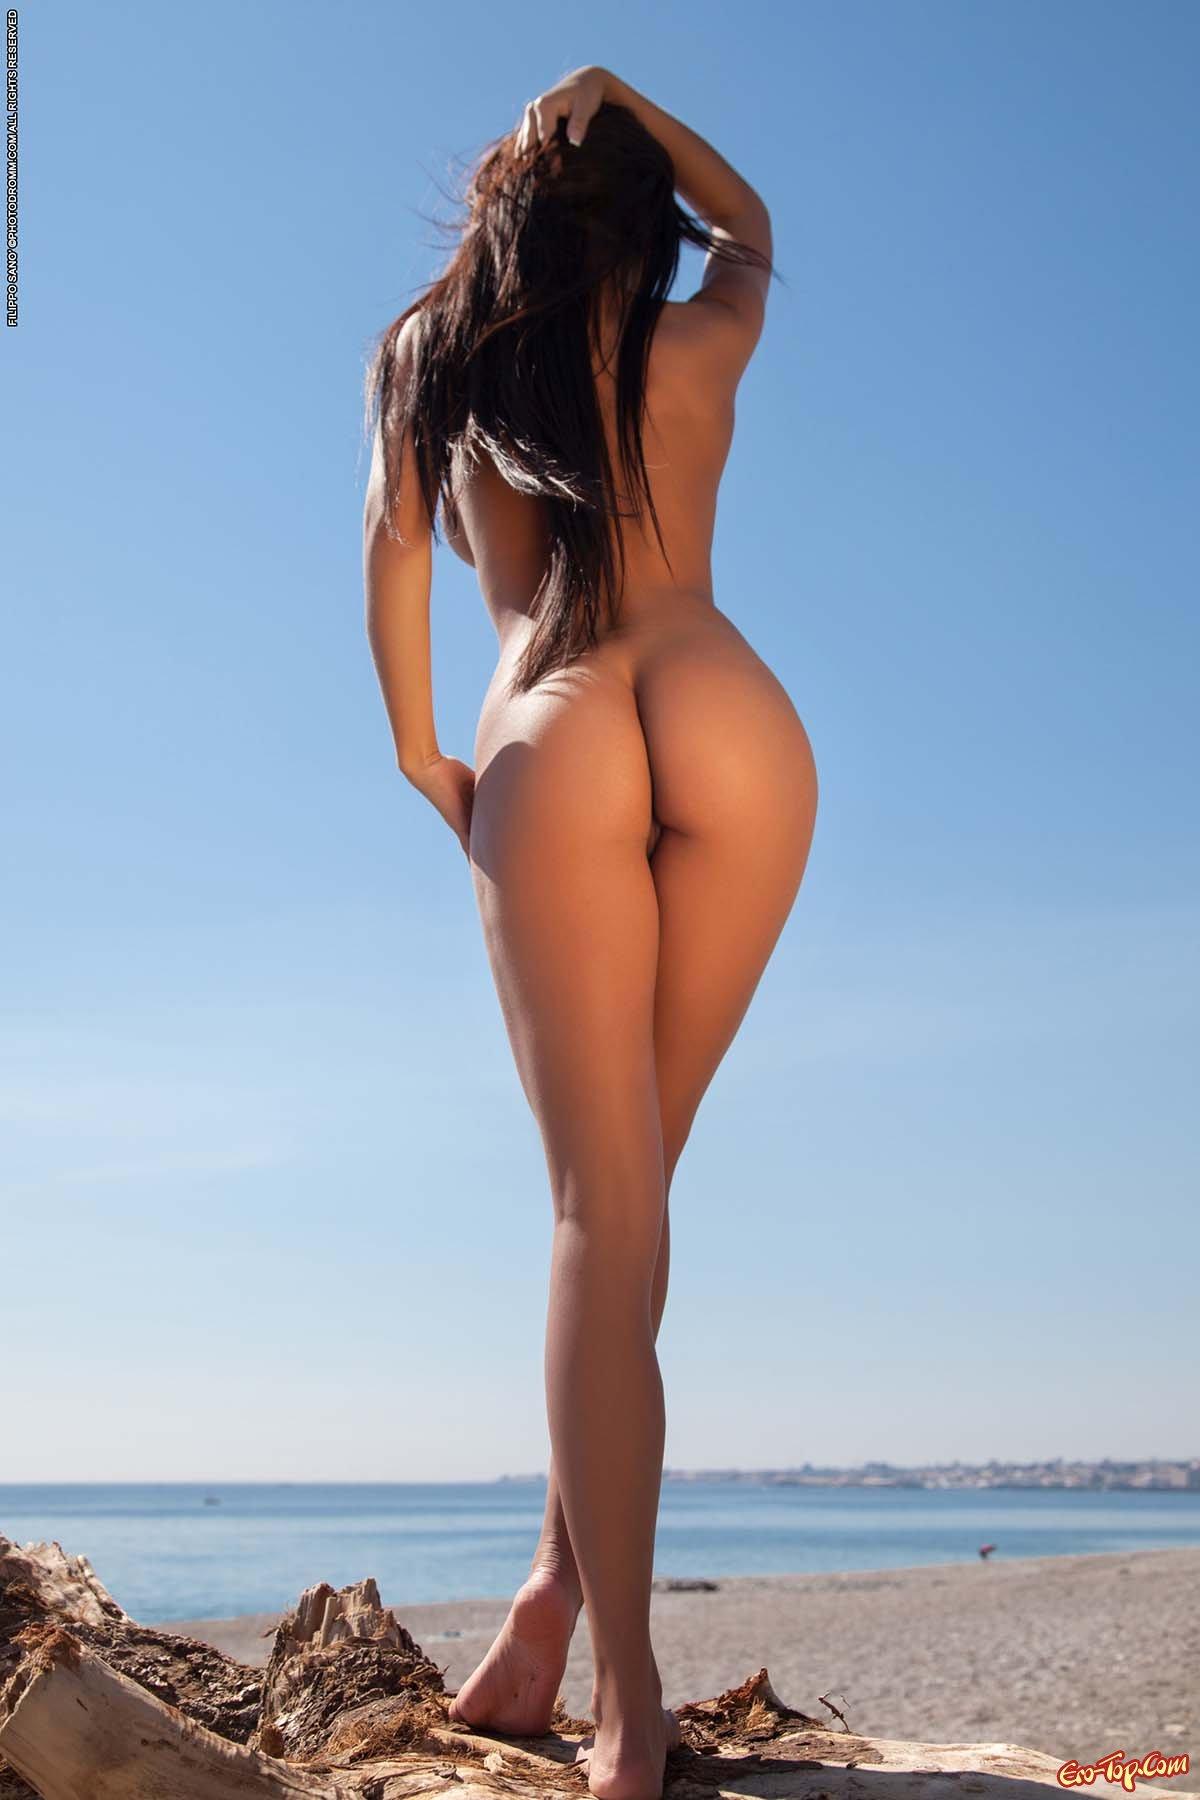 Худая брюнетка на пляже